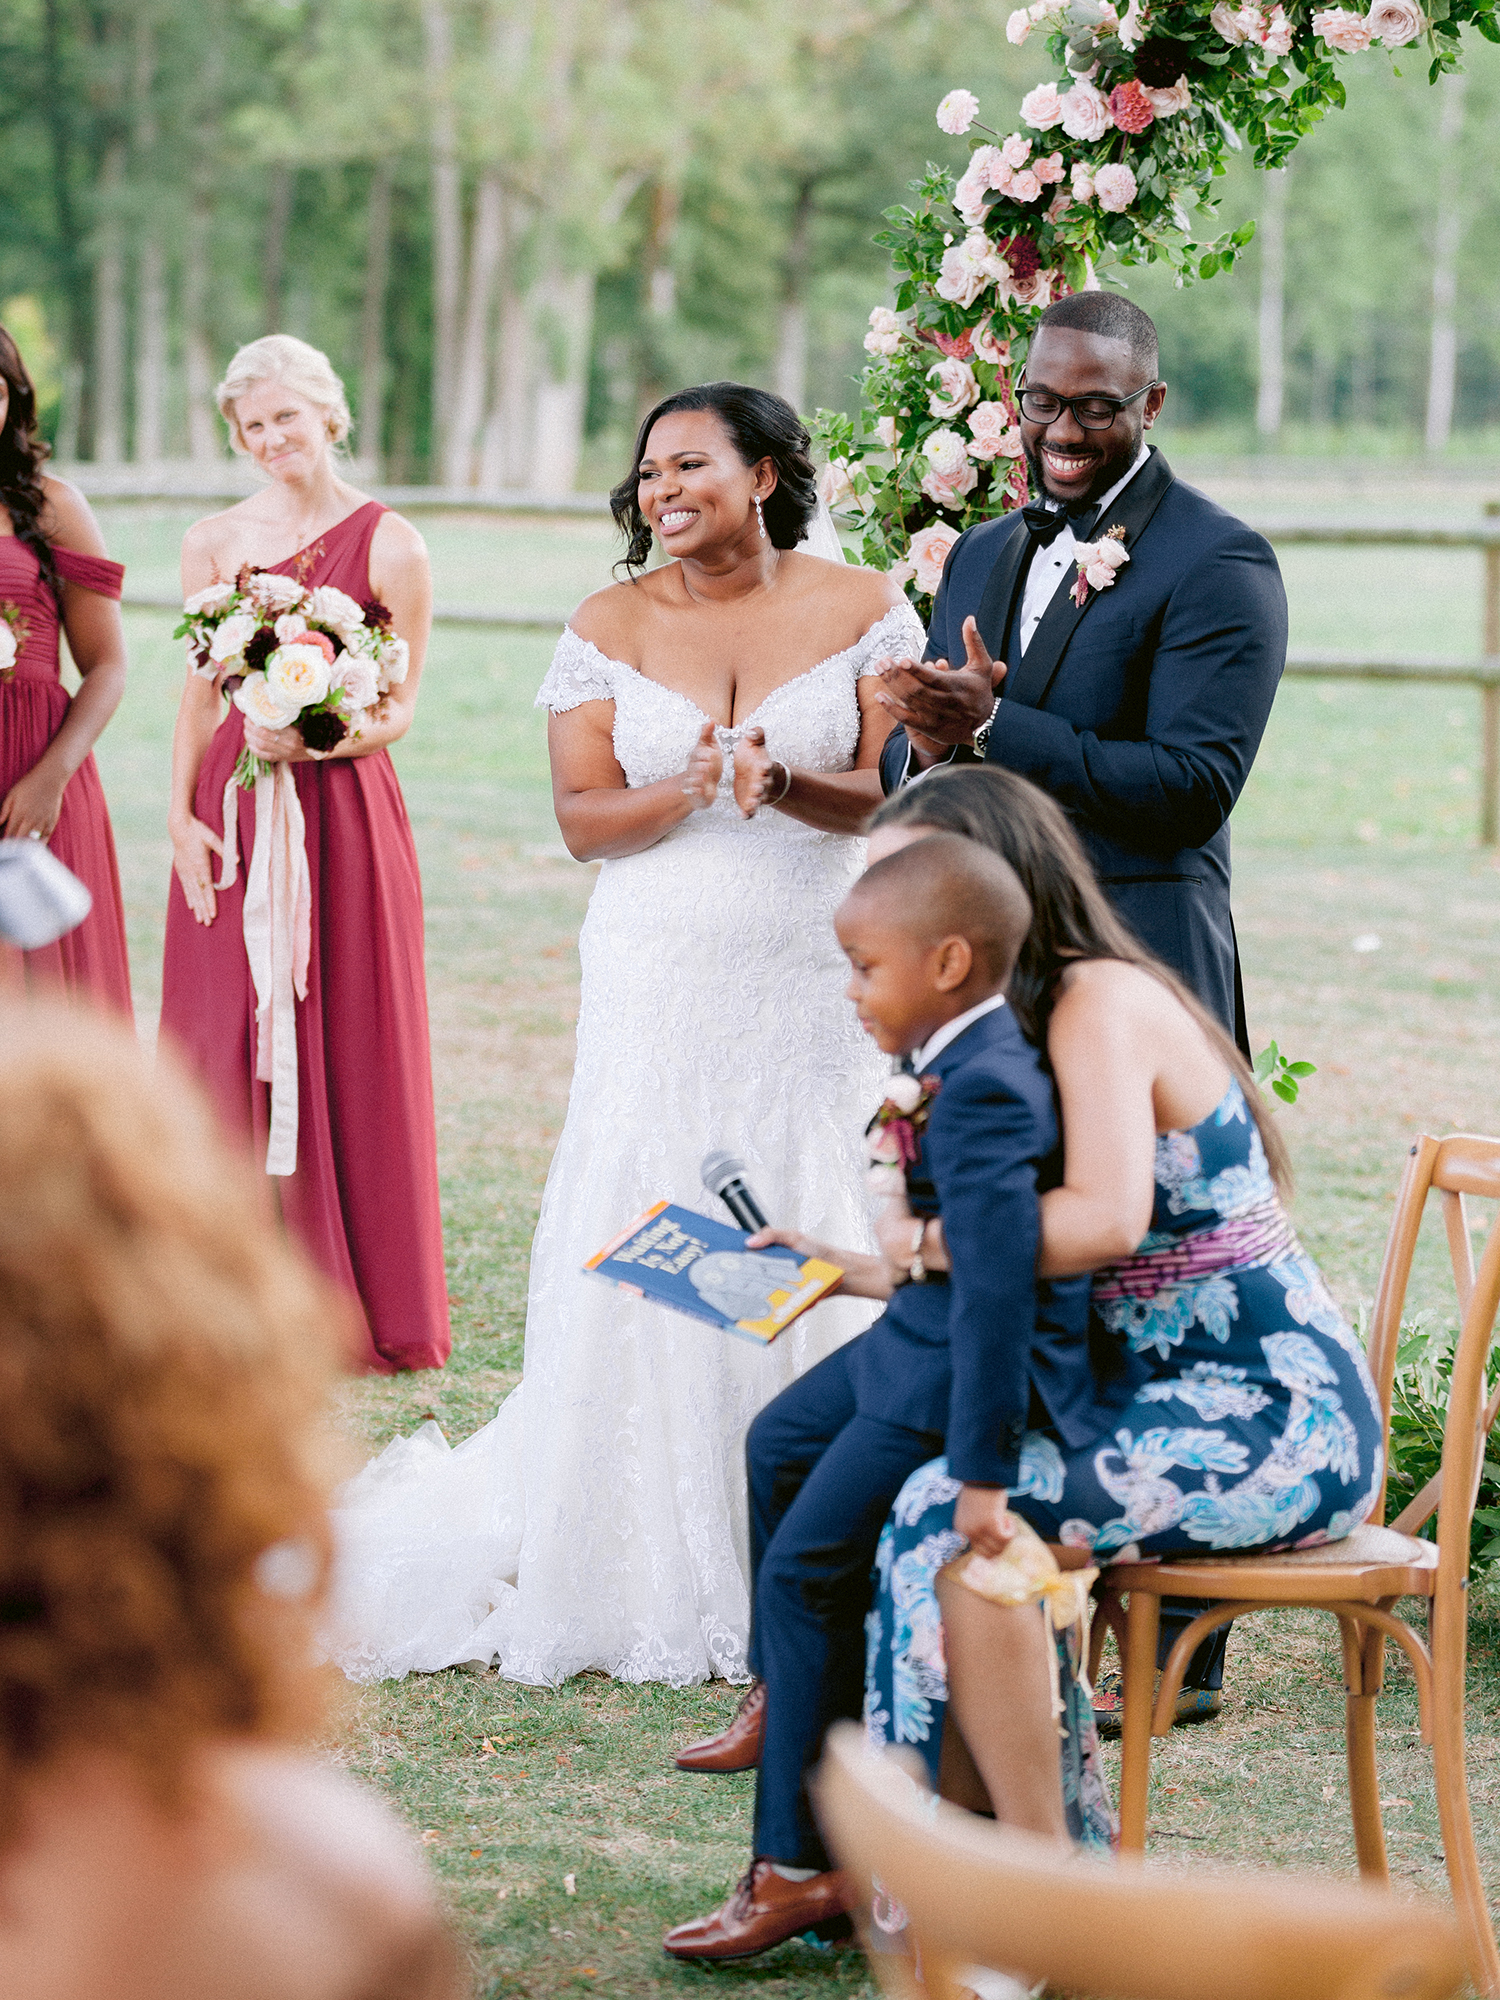 natalie elijah wedding ceremony couple at altar with child